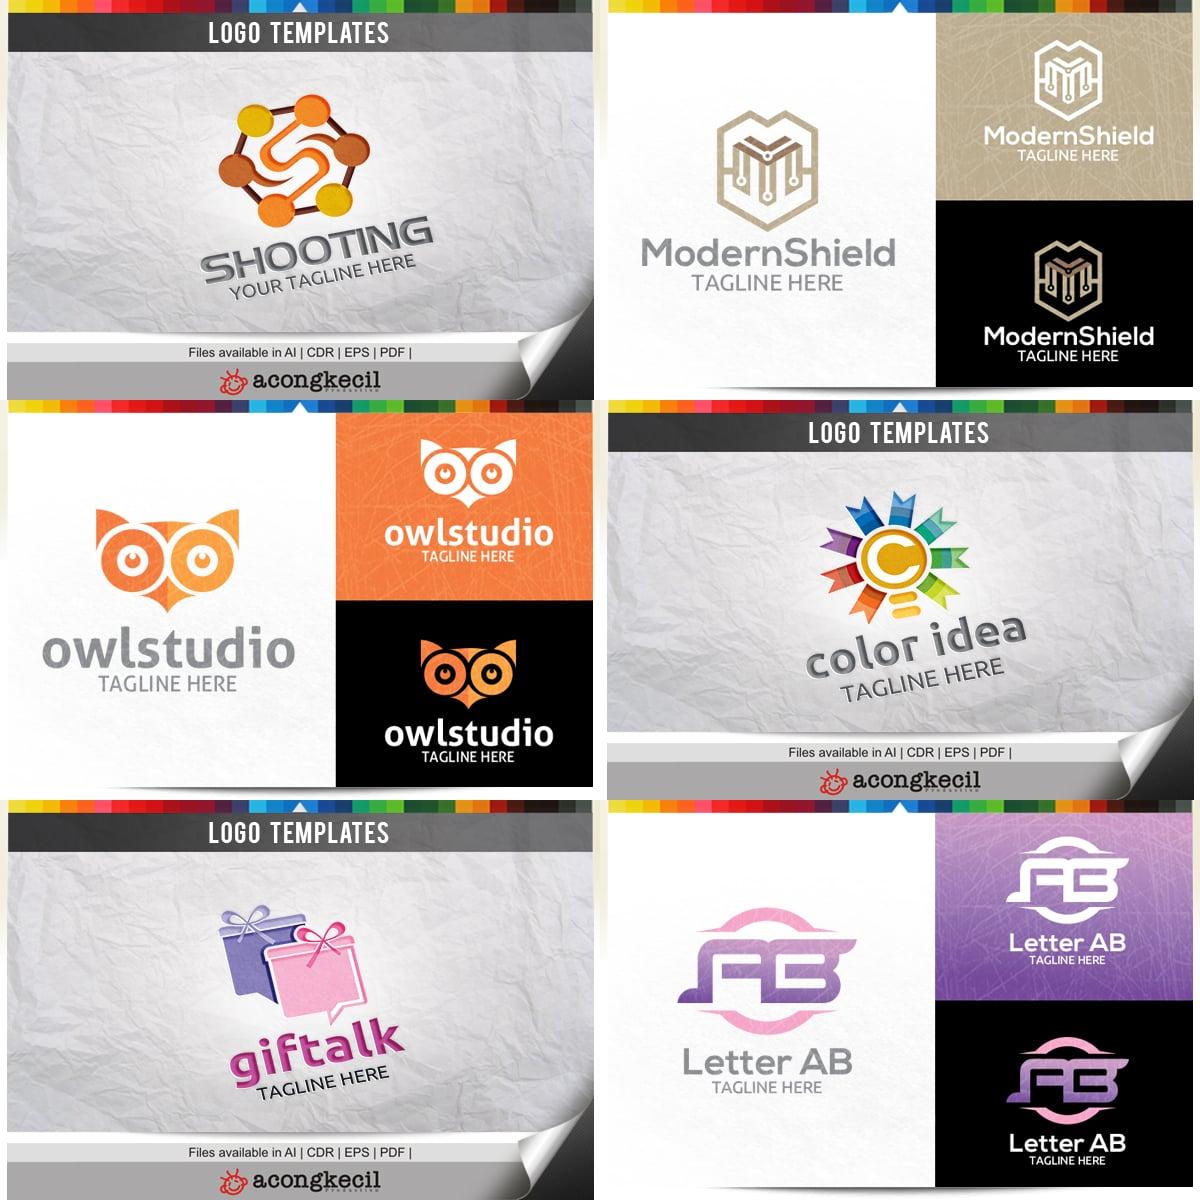 446 Business Logo Bundle - 99%+ OFF - Image Preview 23